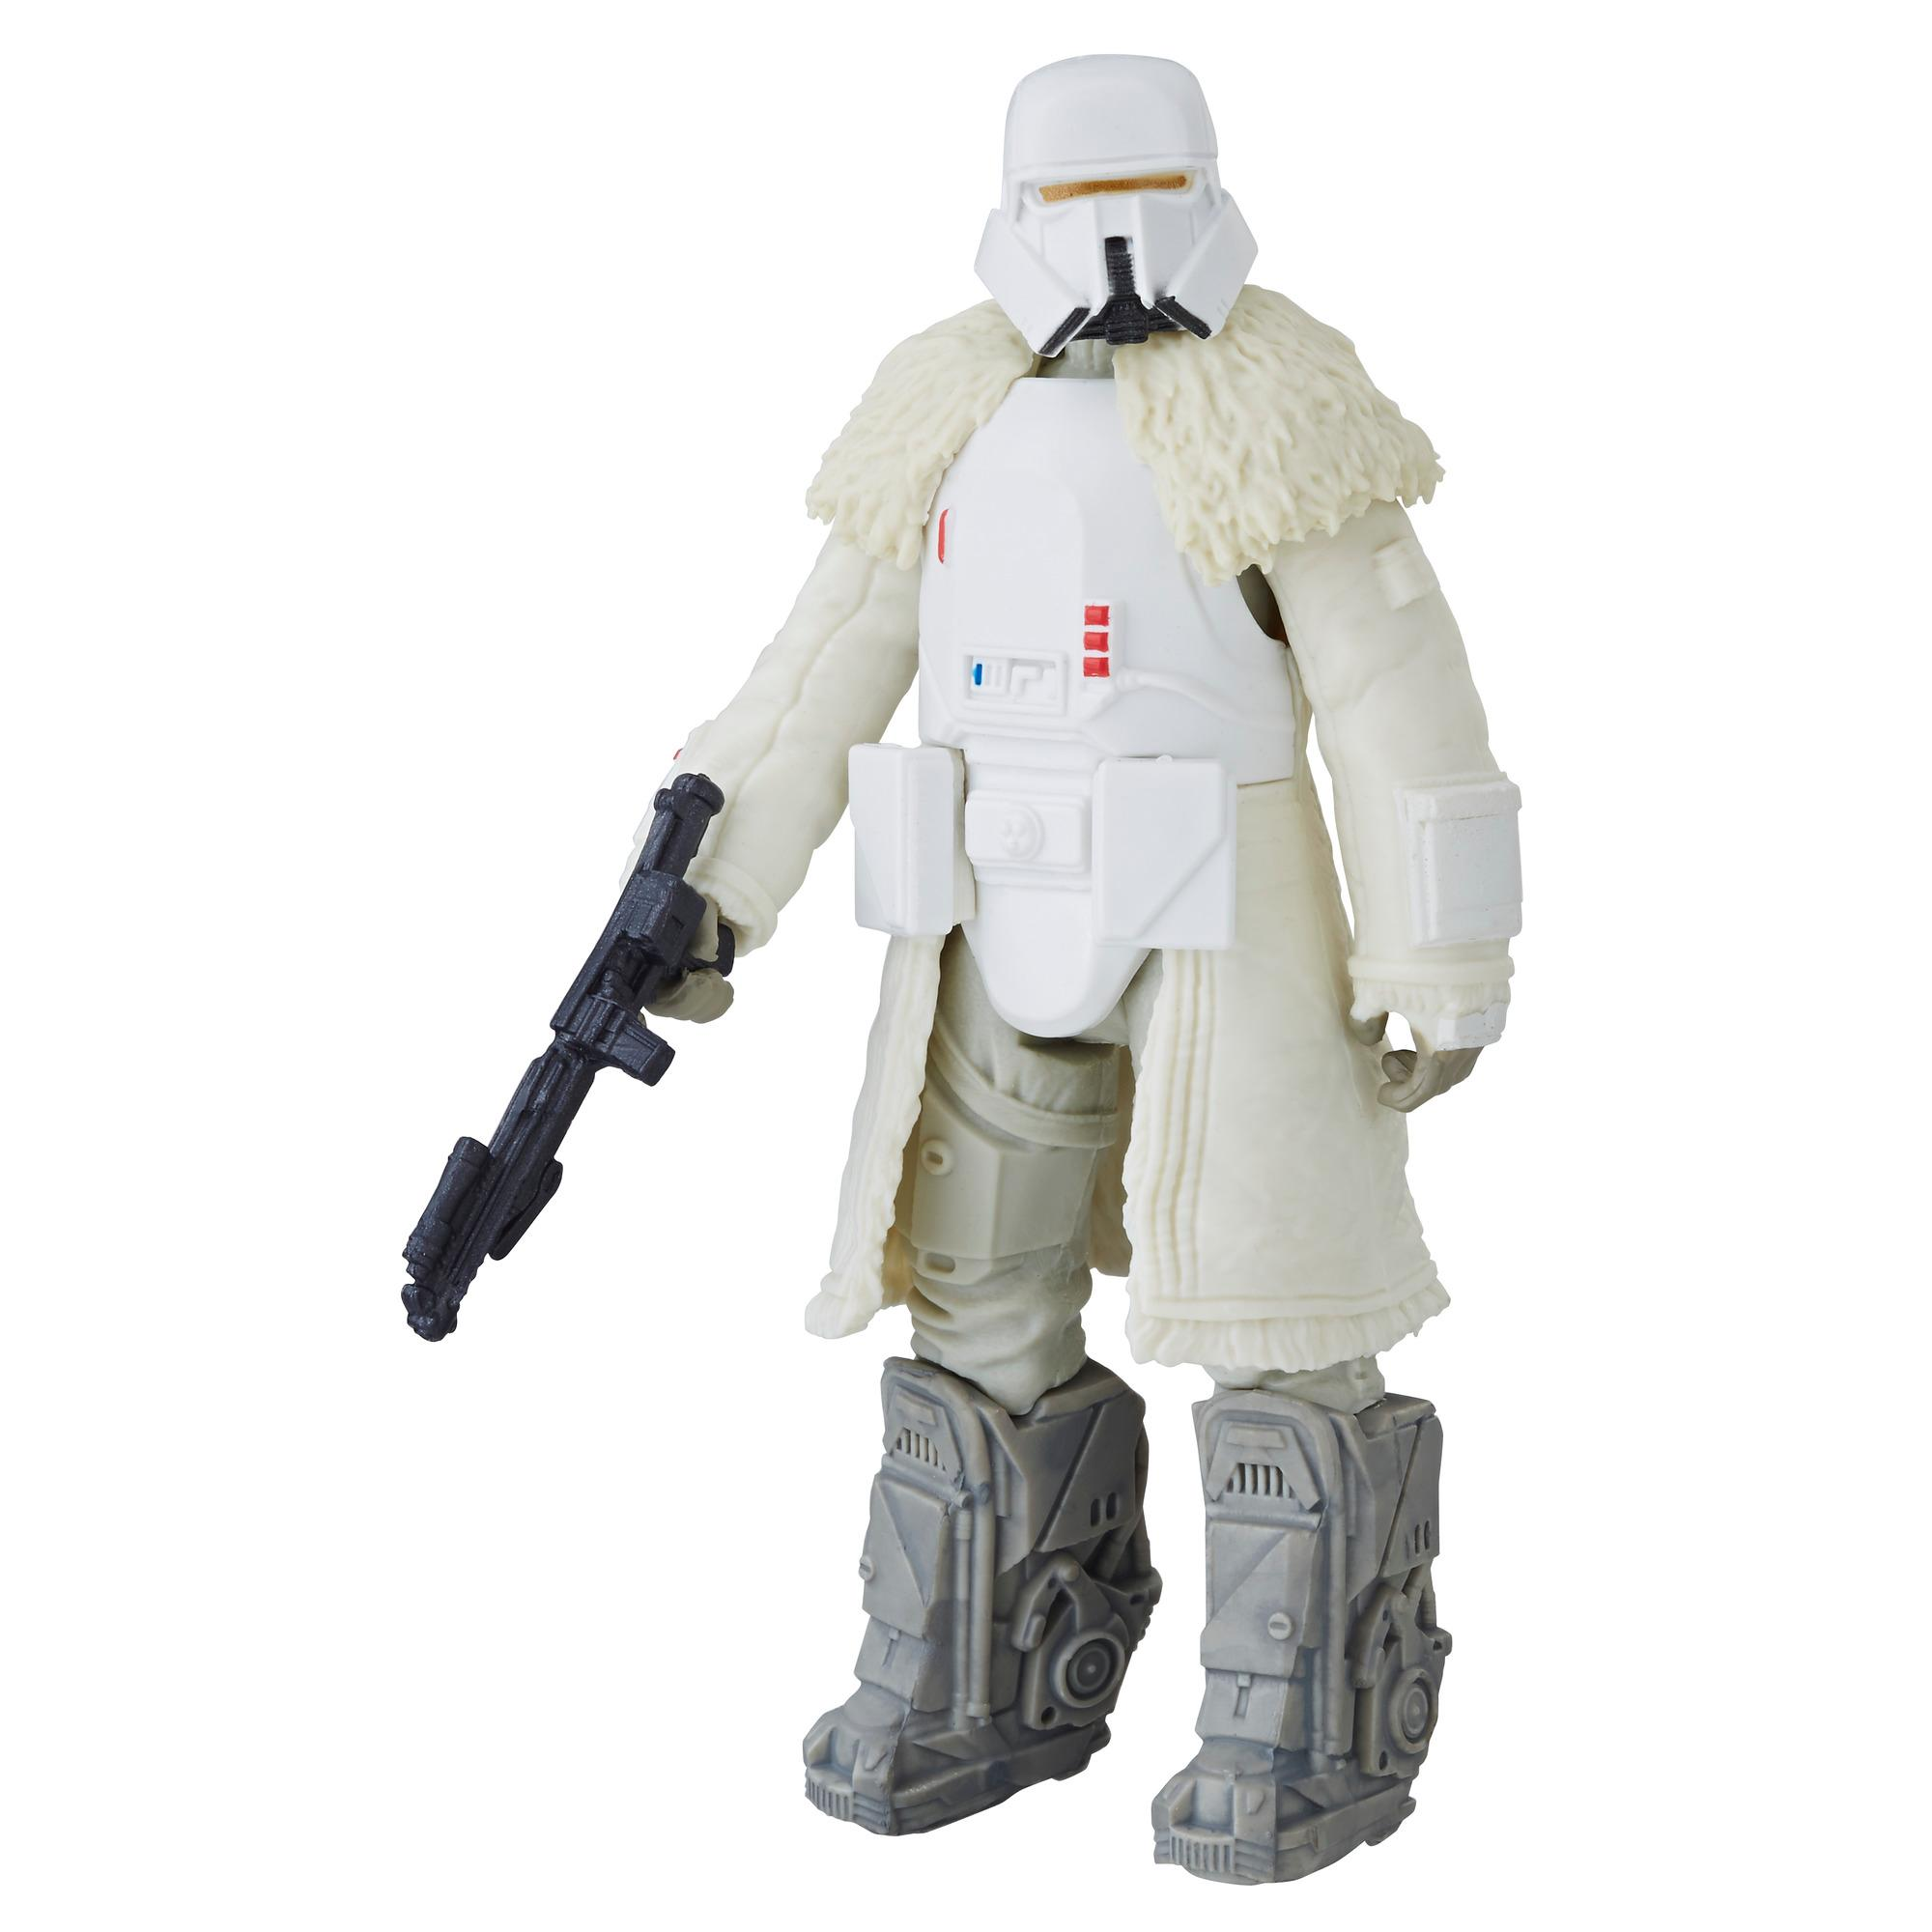 Star Wars Solo Film 3.75 FORCE LINK 2.0 Figur Range Trooper